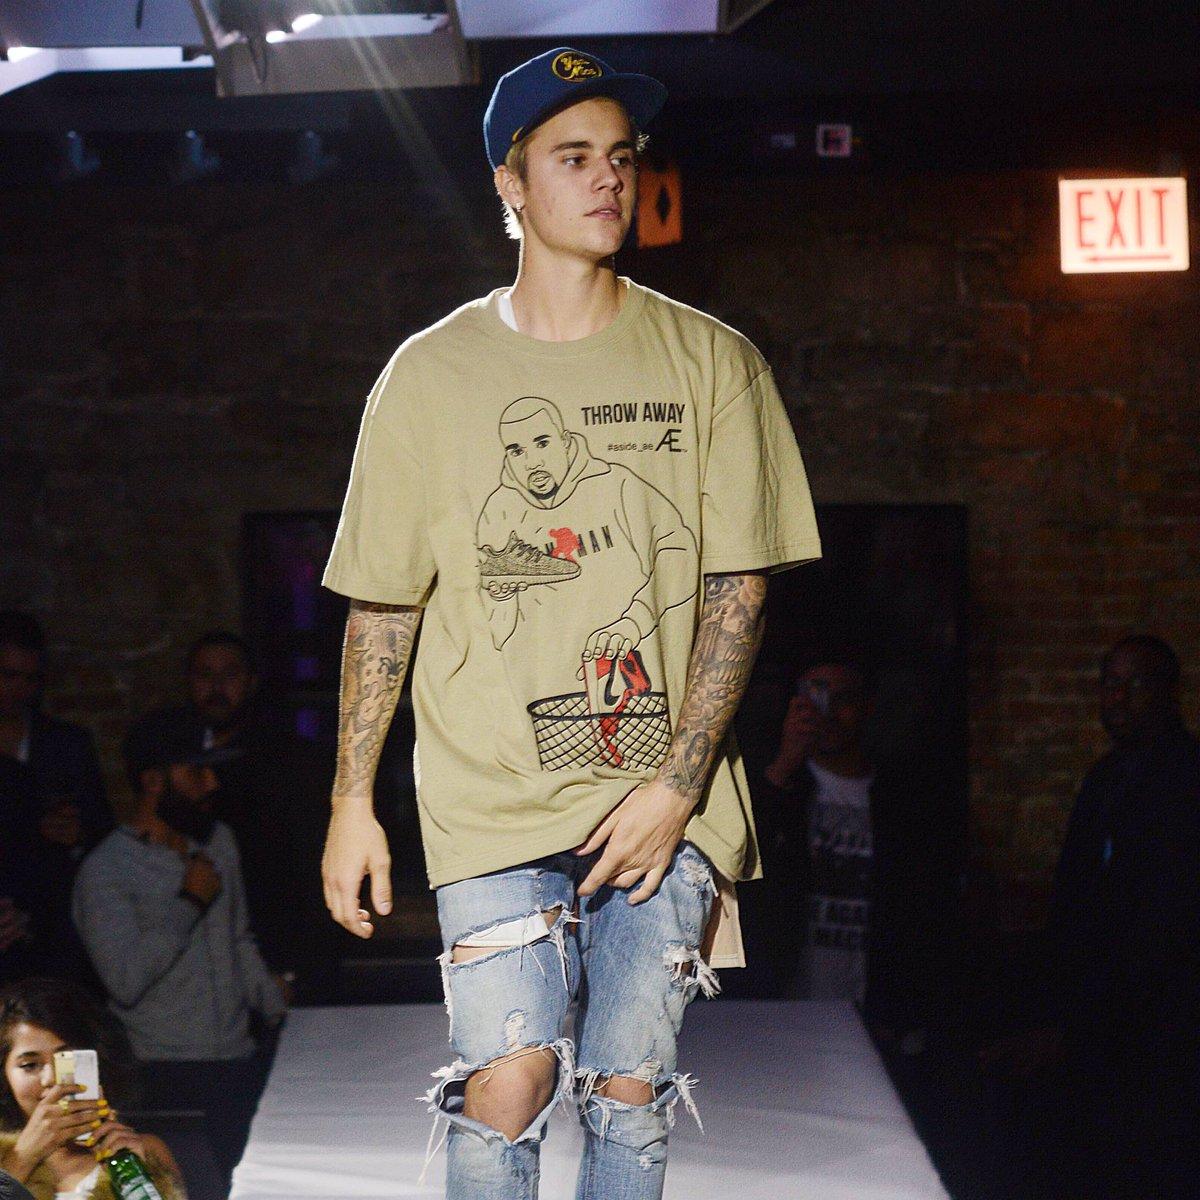 .@JustinBieber lastnight at @UndergroundChi crashing runway, DJ booth, mic, CO2 gun (See my Snapchat BillyDecLive!) https://t.co/5G5hKhquuB